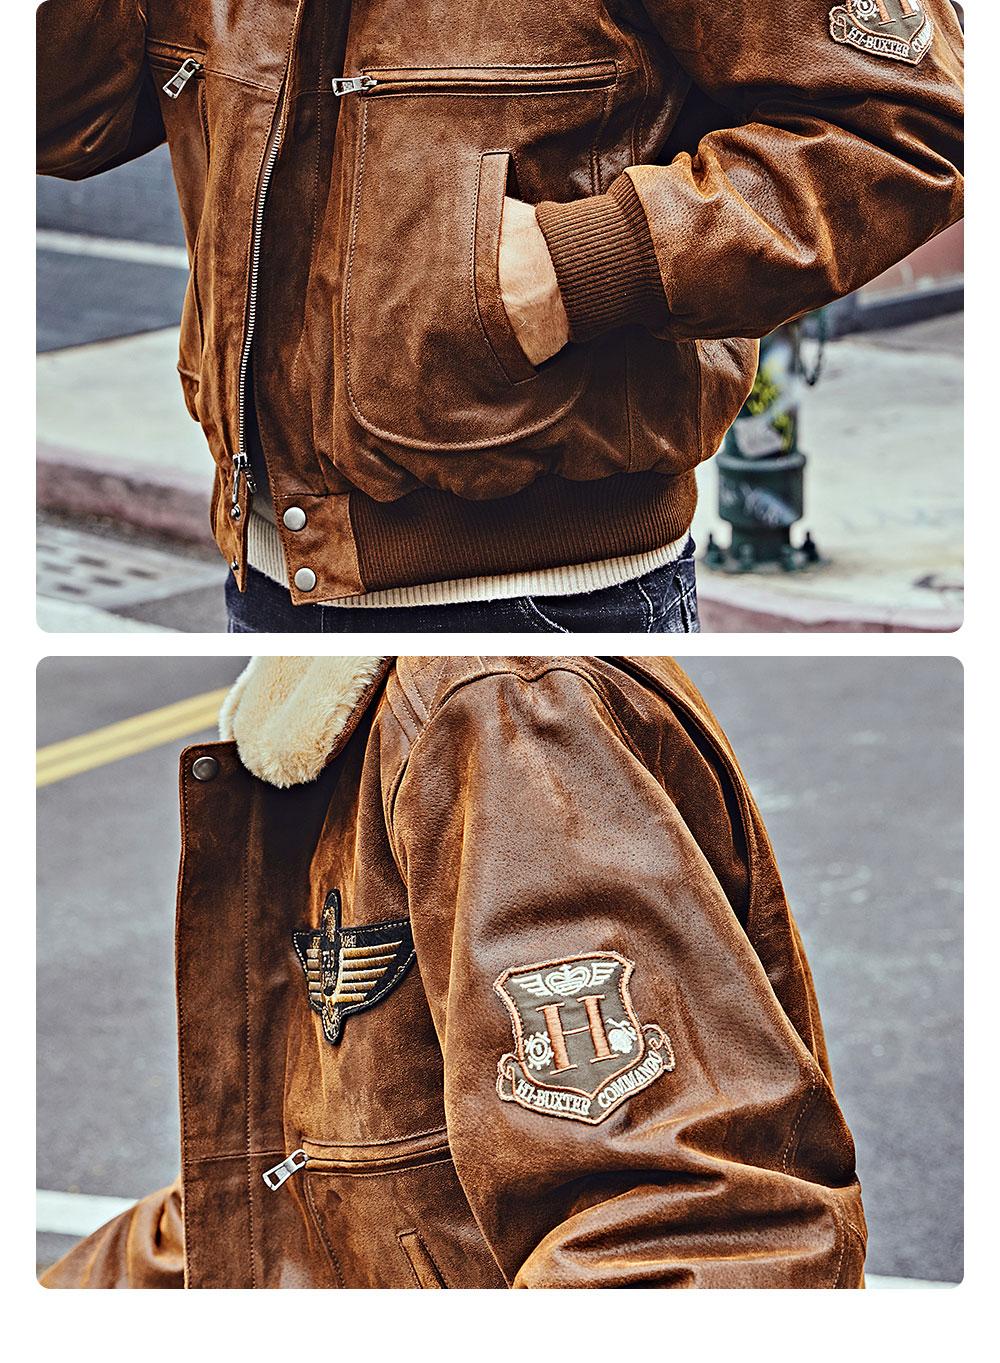 H4f608eba4bd34db08843a78ee6827938V FLAVOR New Men's Real Leather Bomber Jacket with Removable Fur Collar Genuine Leather Pigskin Jackets Winter Warm Coat Men